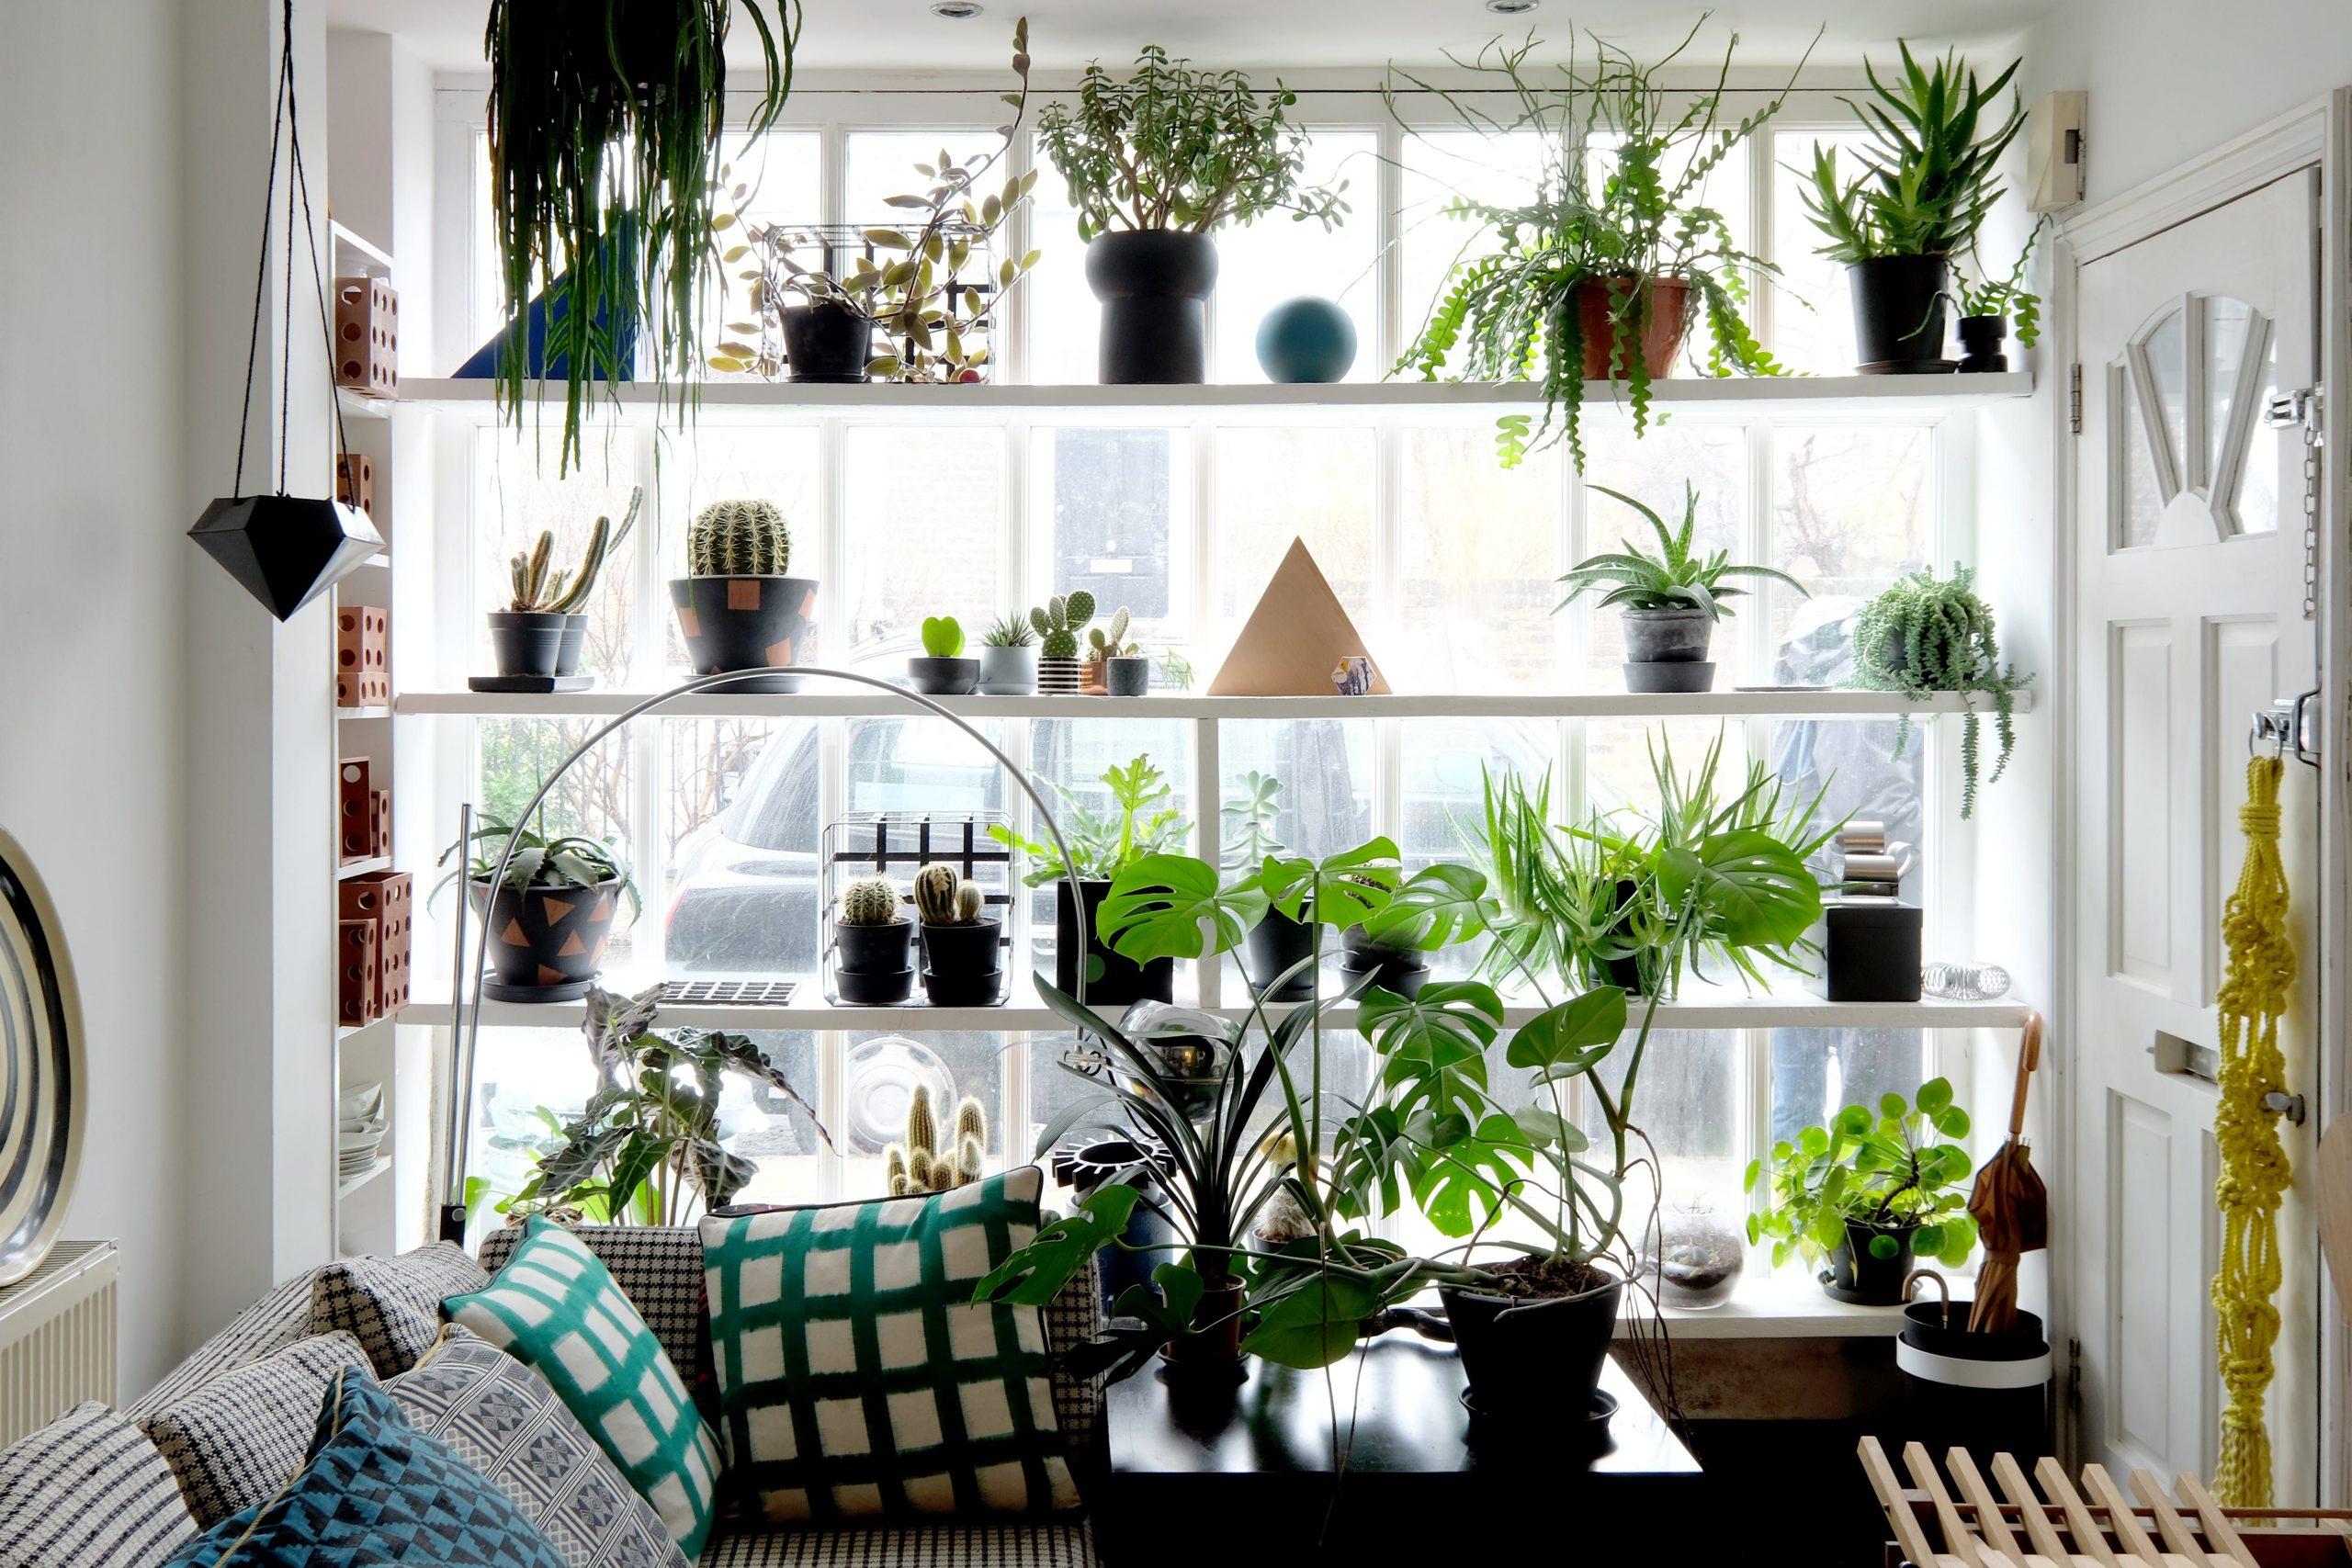 Apartment windowsill accessories